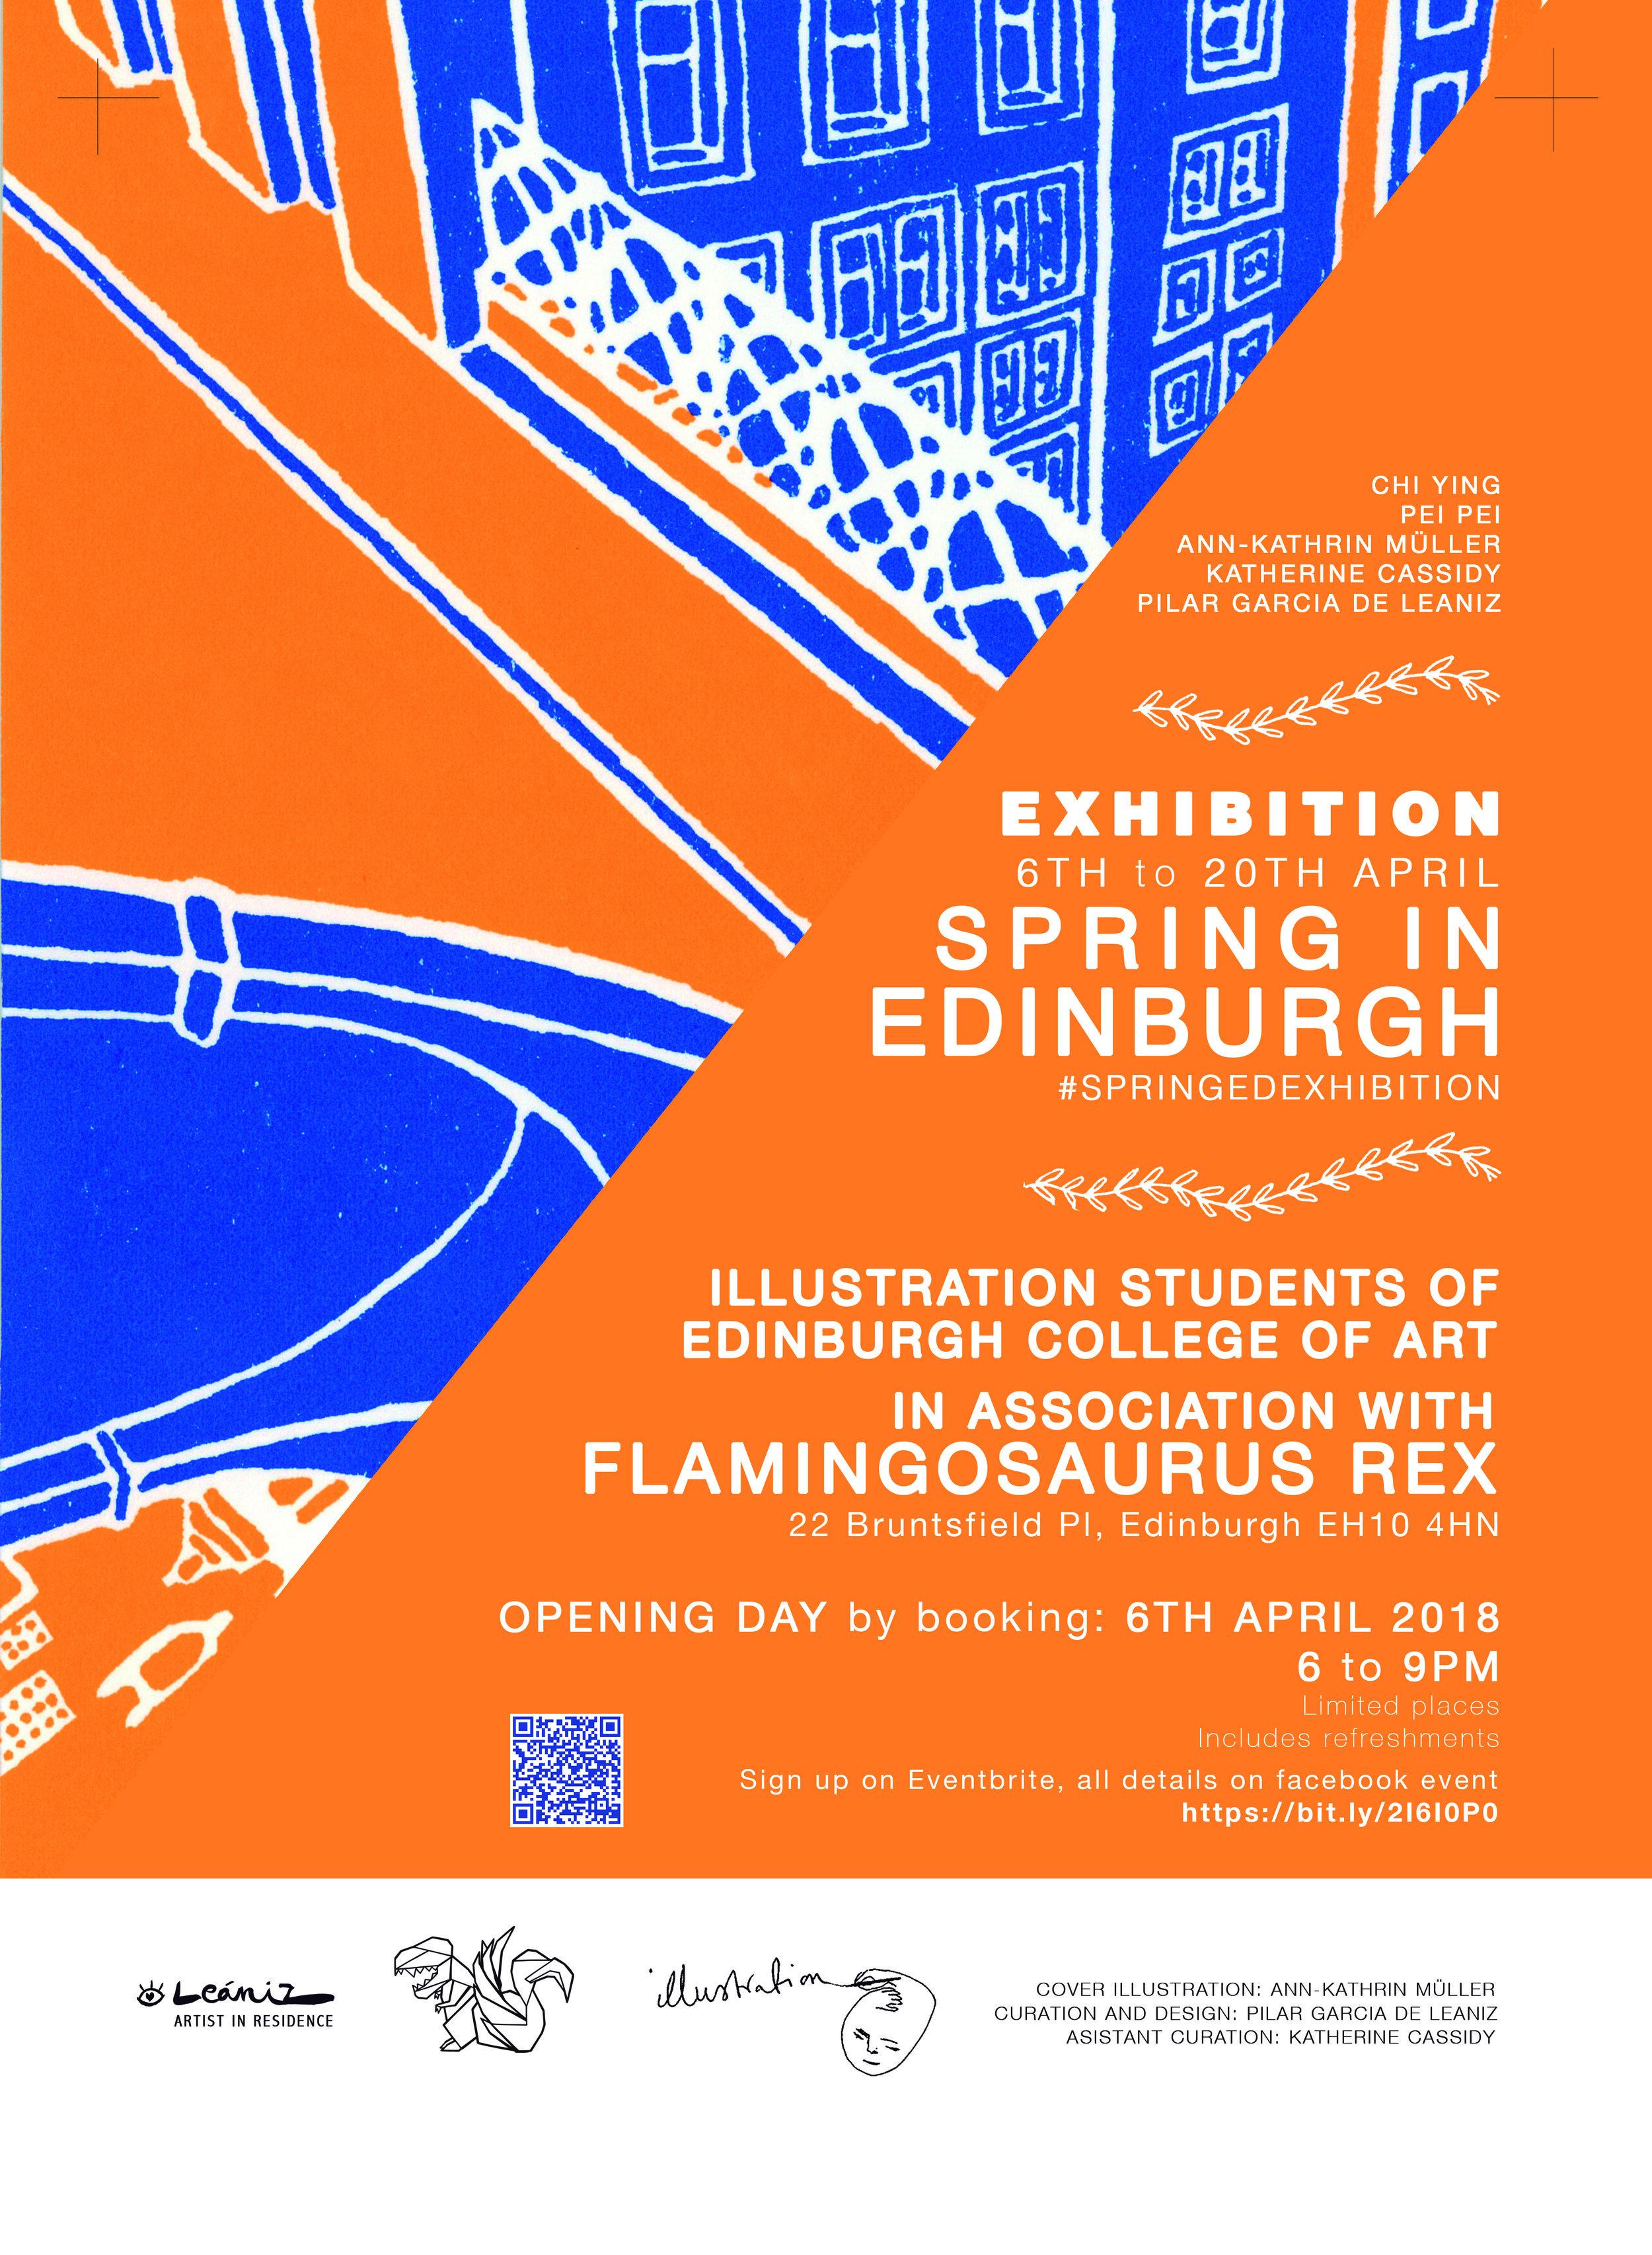 Exhibition + Curation  Flamingosaurus Rex art shop gallery + the Edinburgh College of Art, 2018.